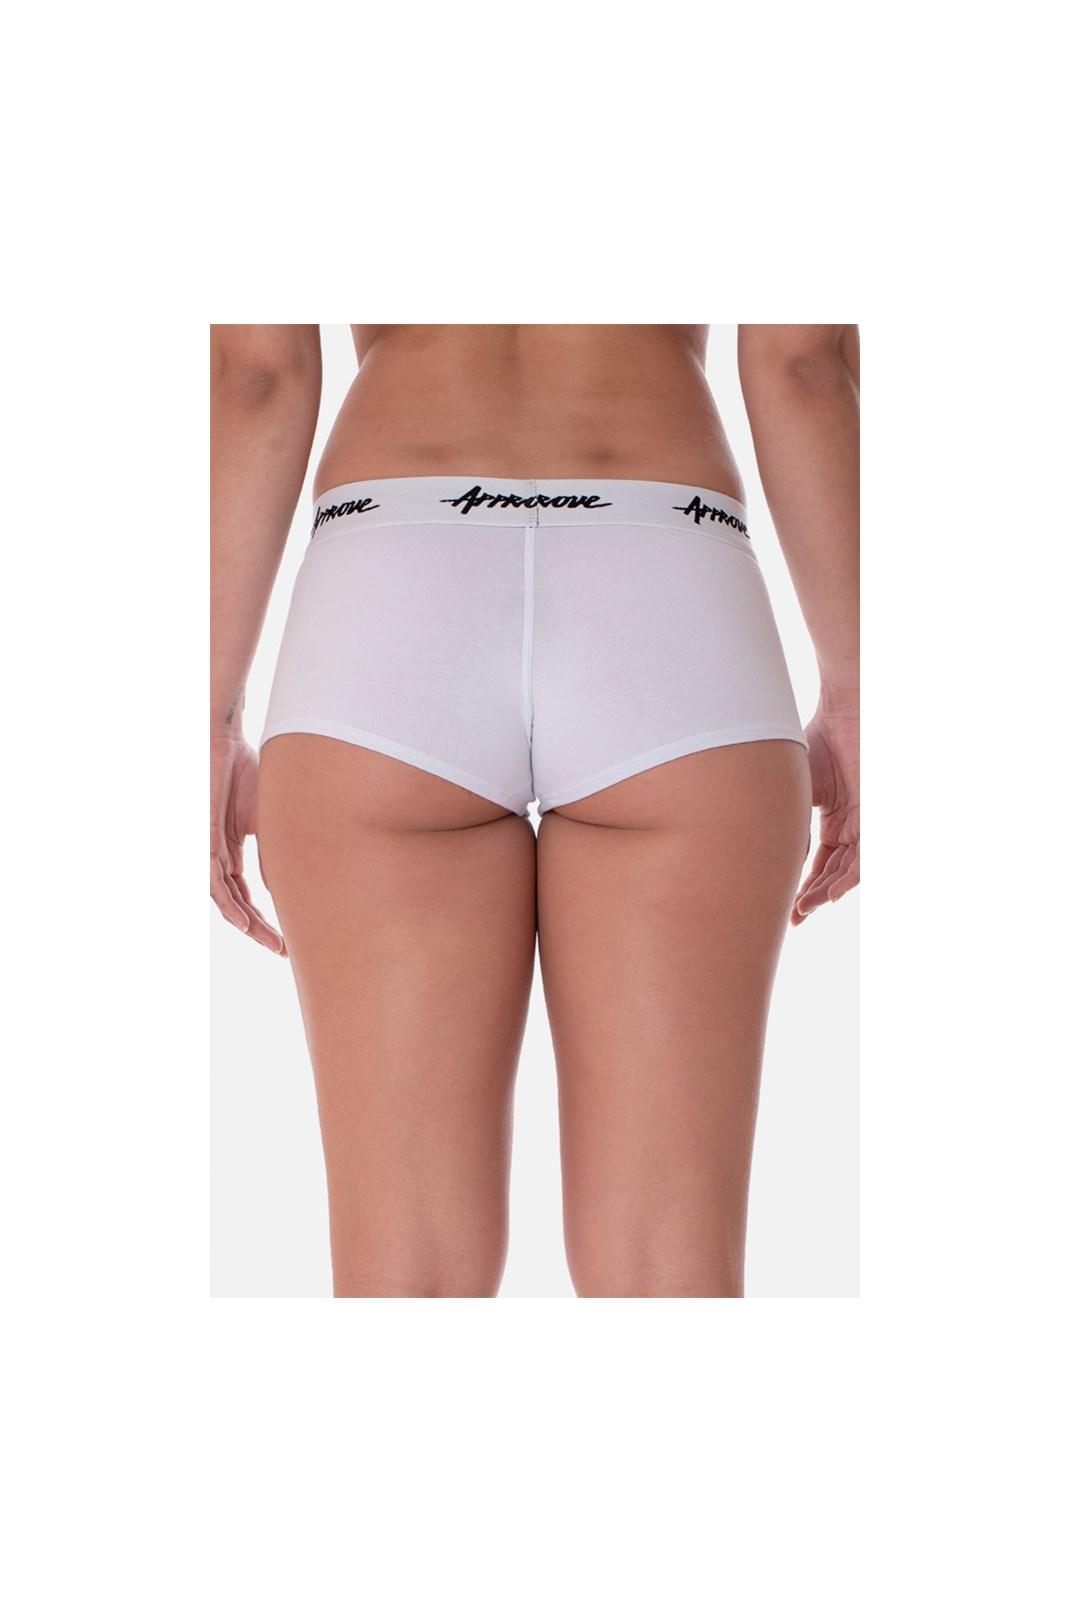 Kit 3 Shorts Underwear Approve Branco